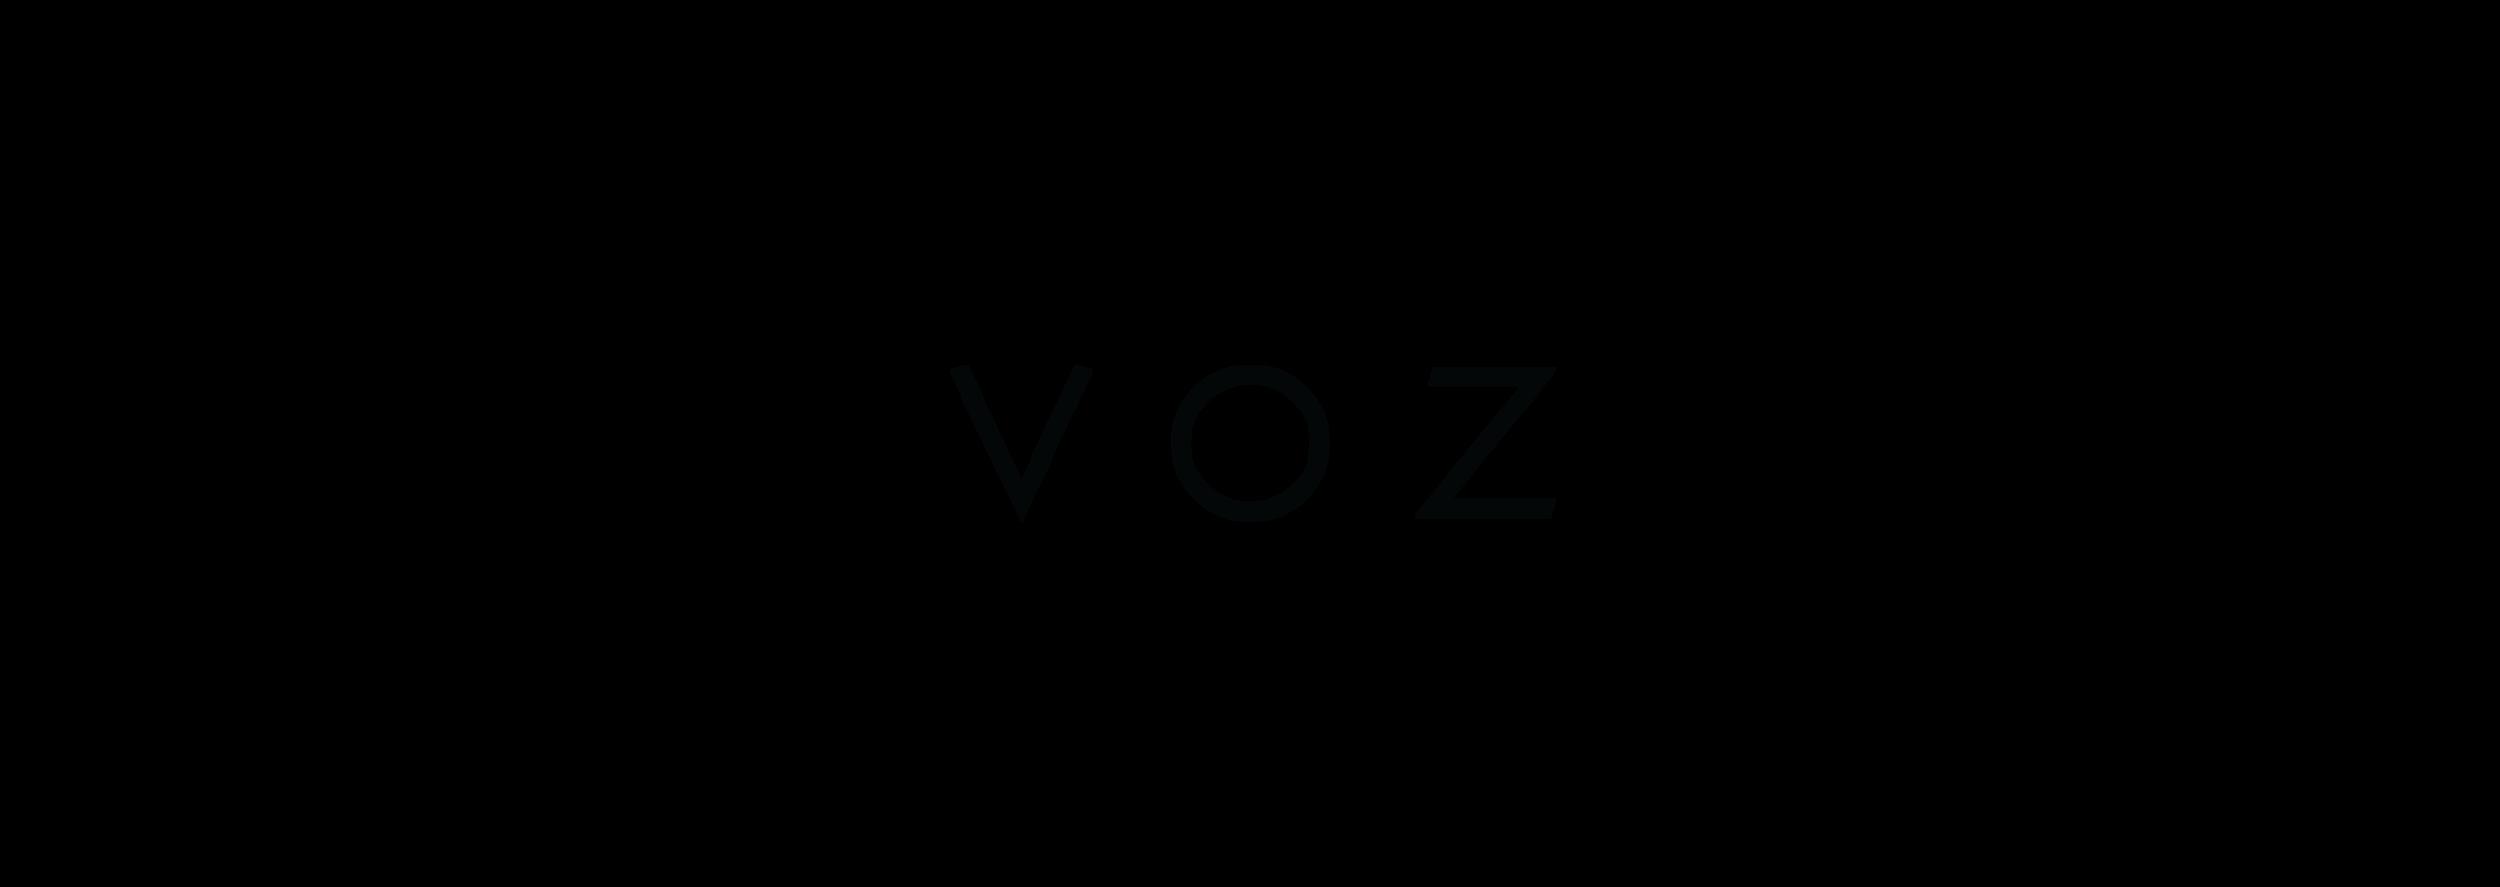 VOZlong.png